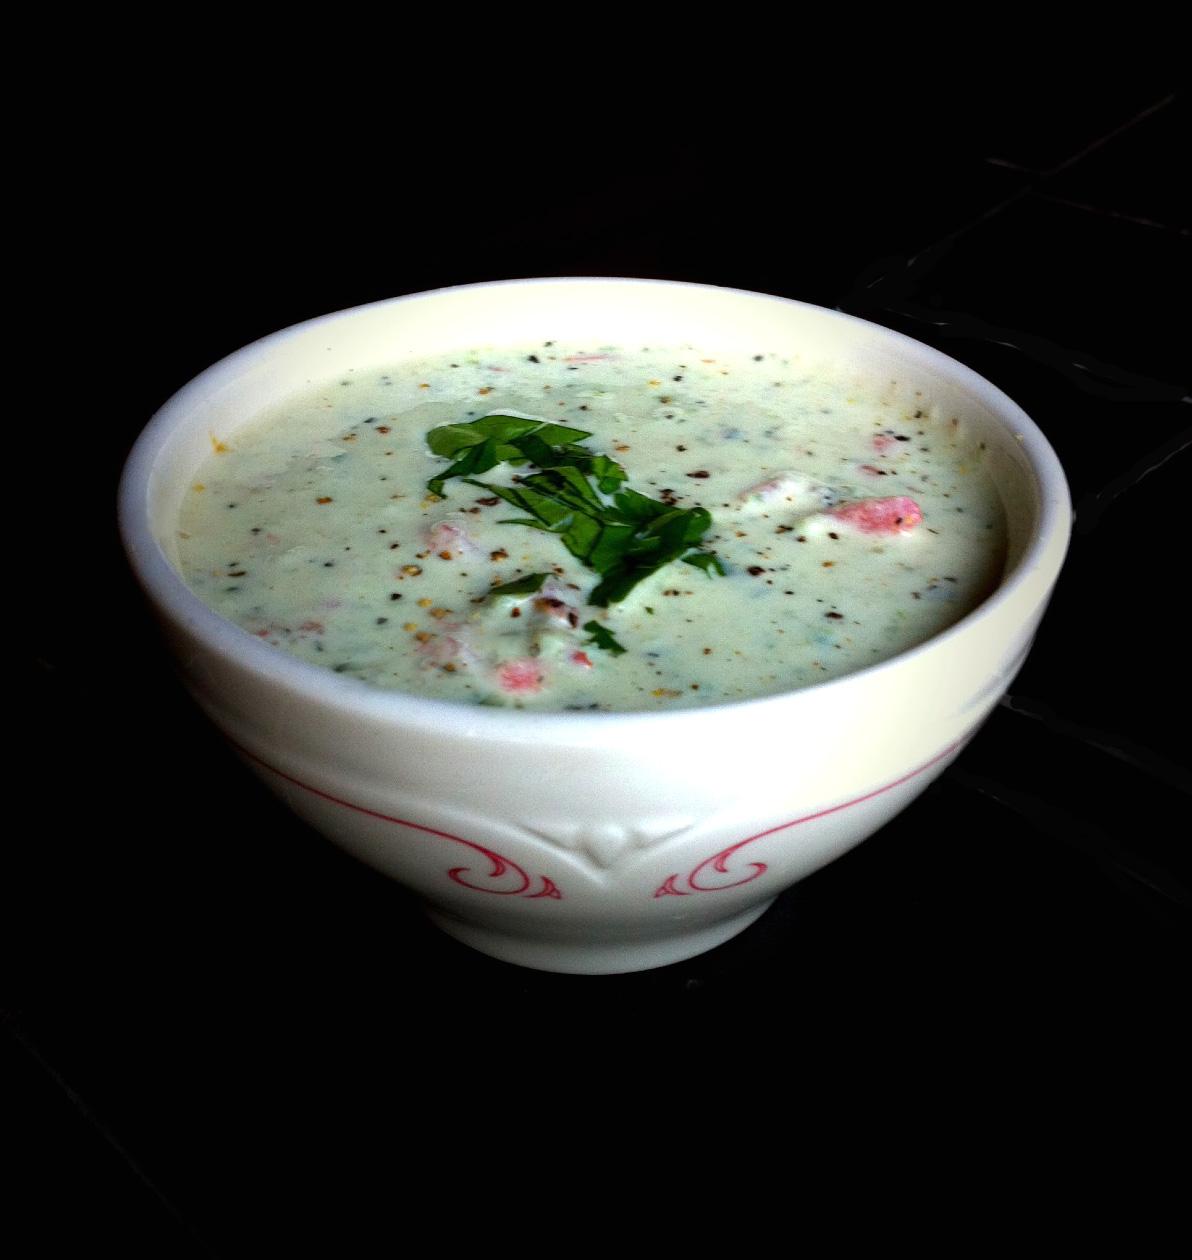 ... , Jalapeno & Cucumber Yogurt Raita | Delightful-Delicious-Delovely